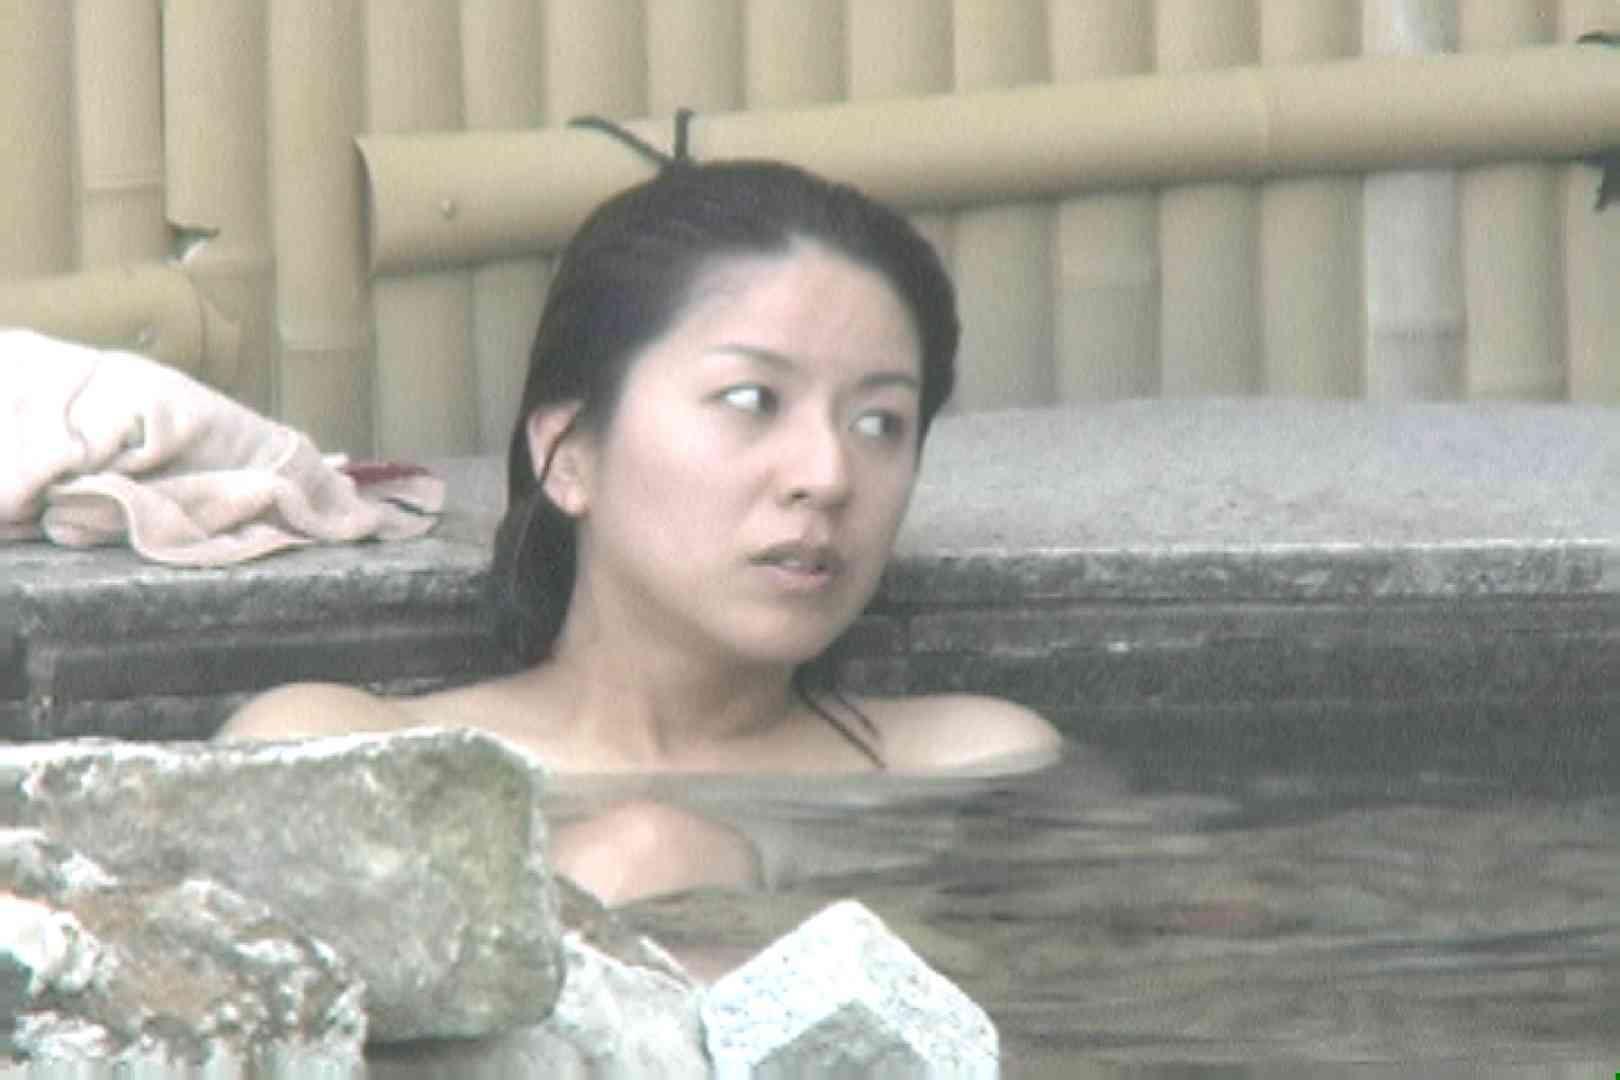 Aquaな露天風呂Vol.694 盗撮 | OLエロ画像  110PICs 106